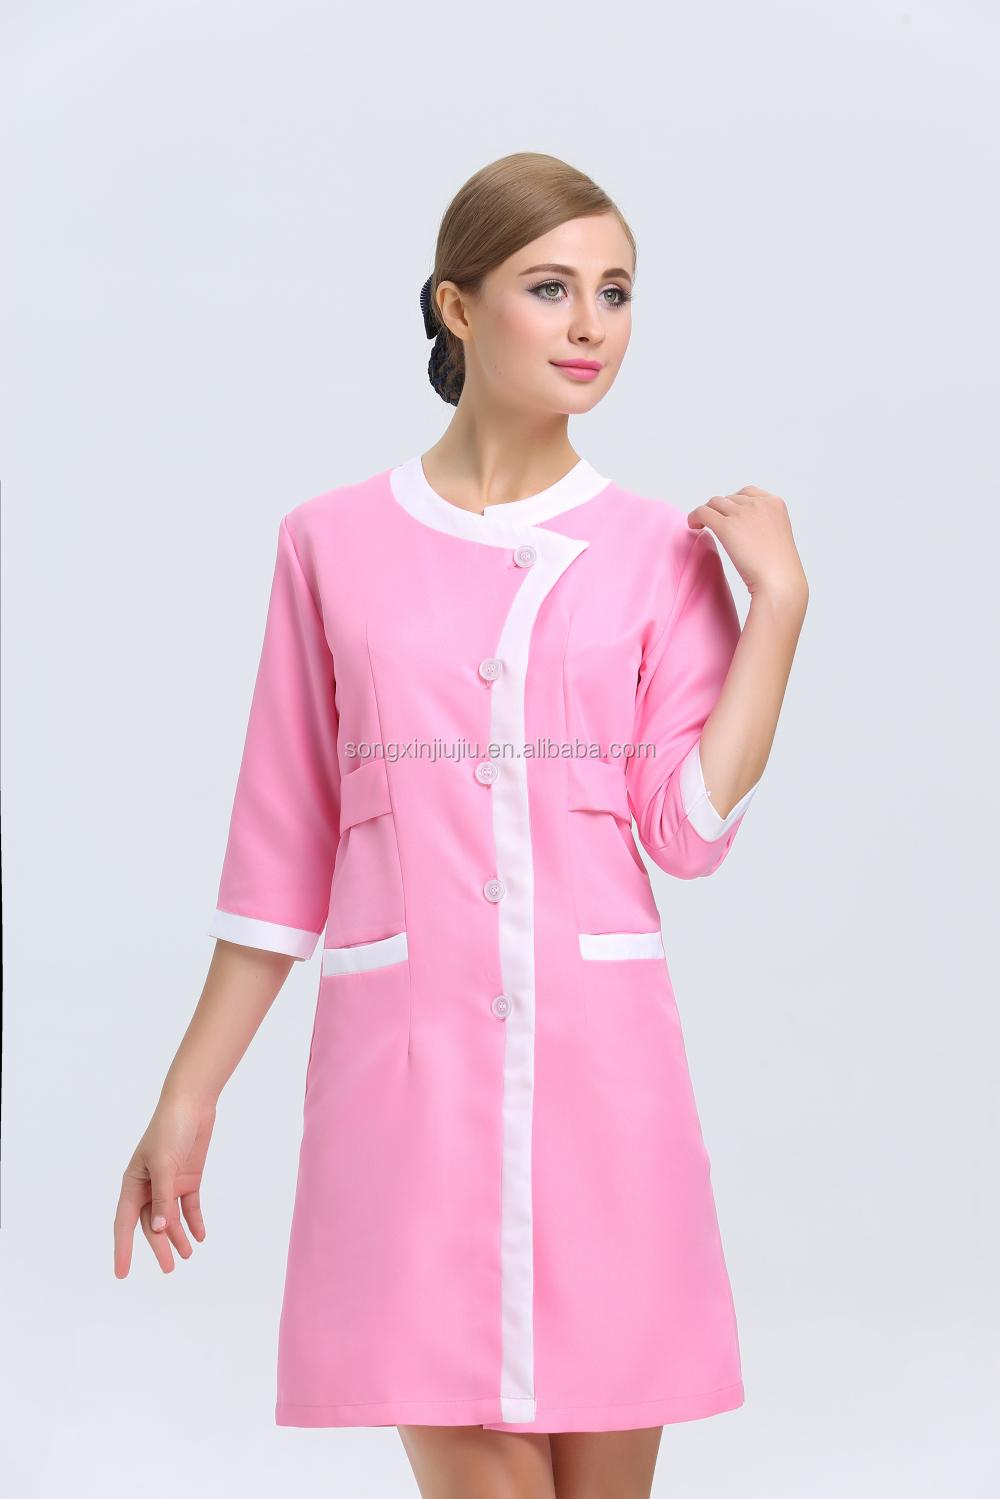 Top selling spa salon uniforms salon wear cheap spa and for Spa uniform alibaba